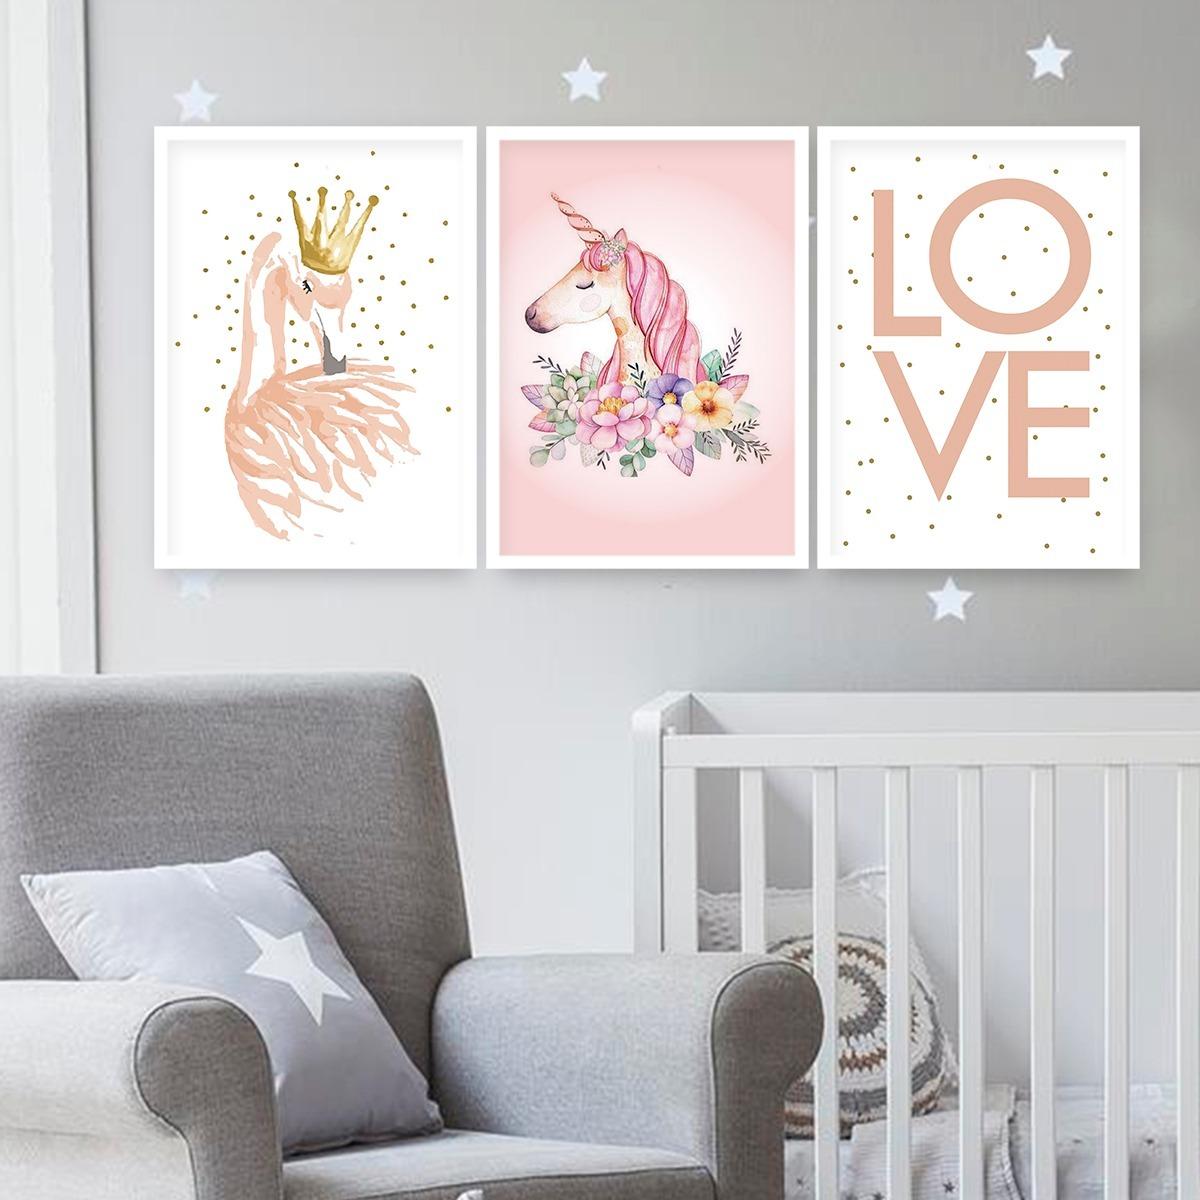 093c8b3c8 kit quadros quarto bebe c moldura e vidro unicórnio rosa. Carregando zoom.